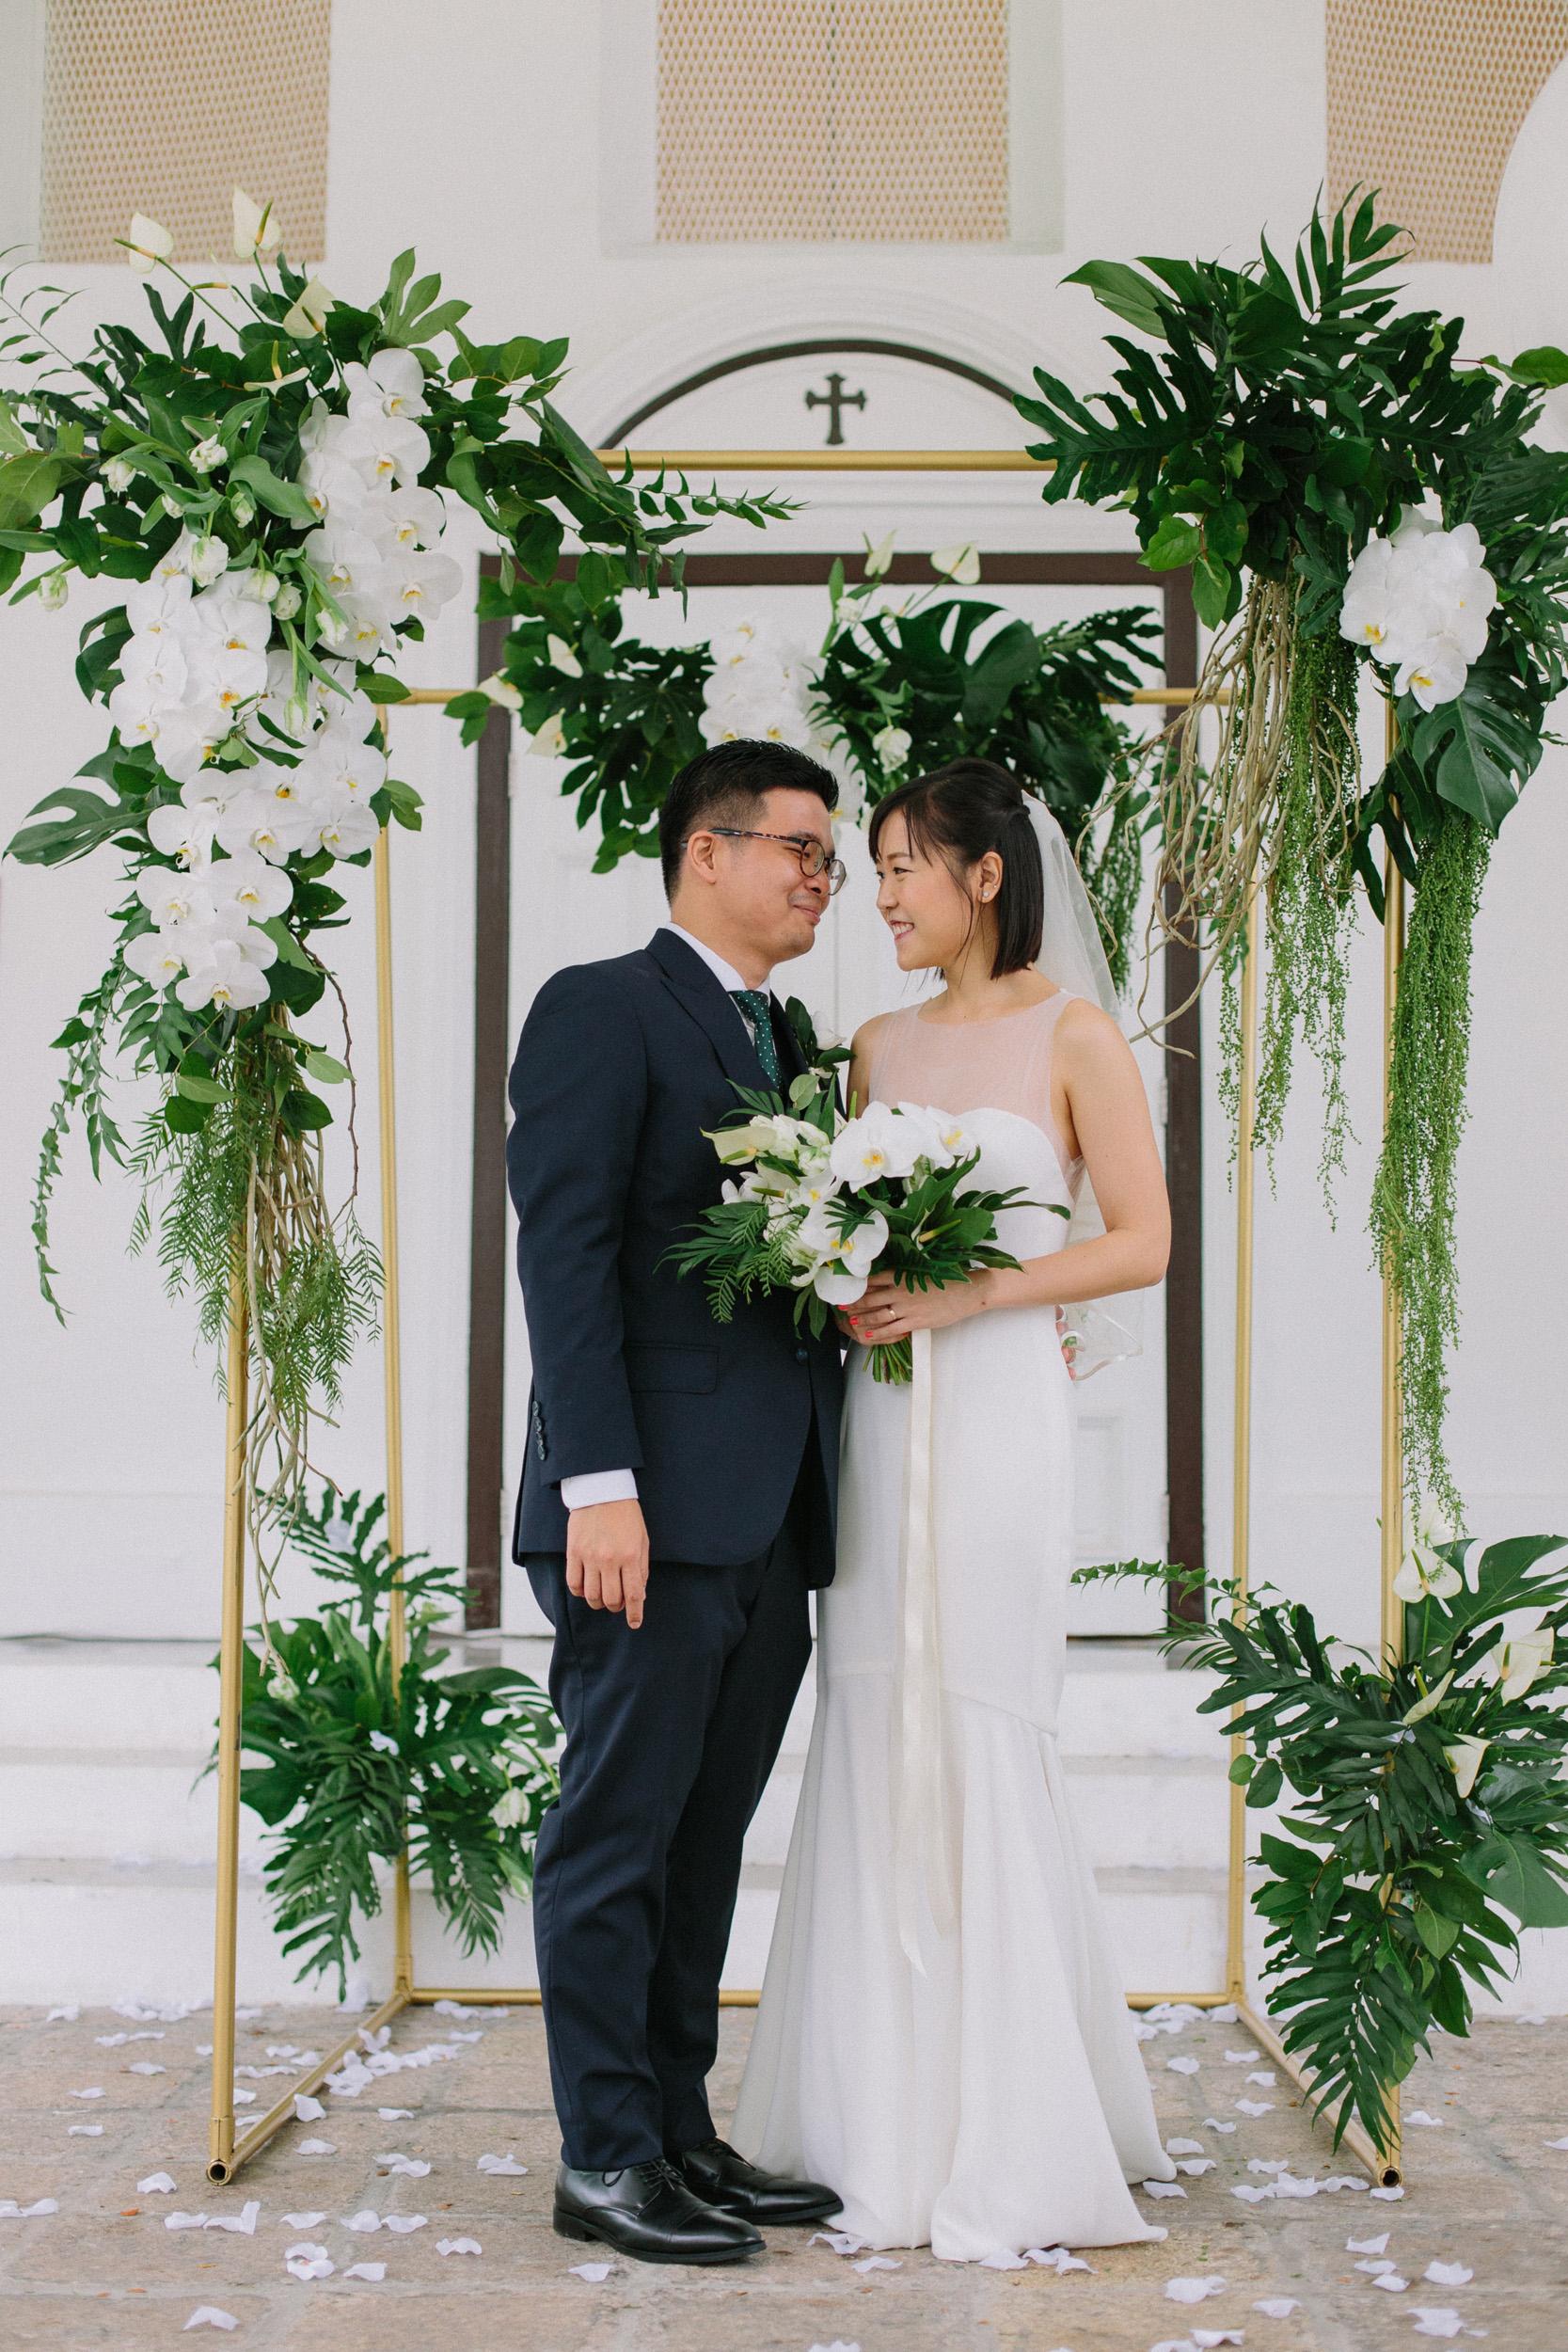 singapore-wedding-photographer-photography-wmt2017-054.jpg